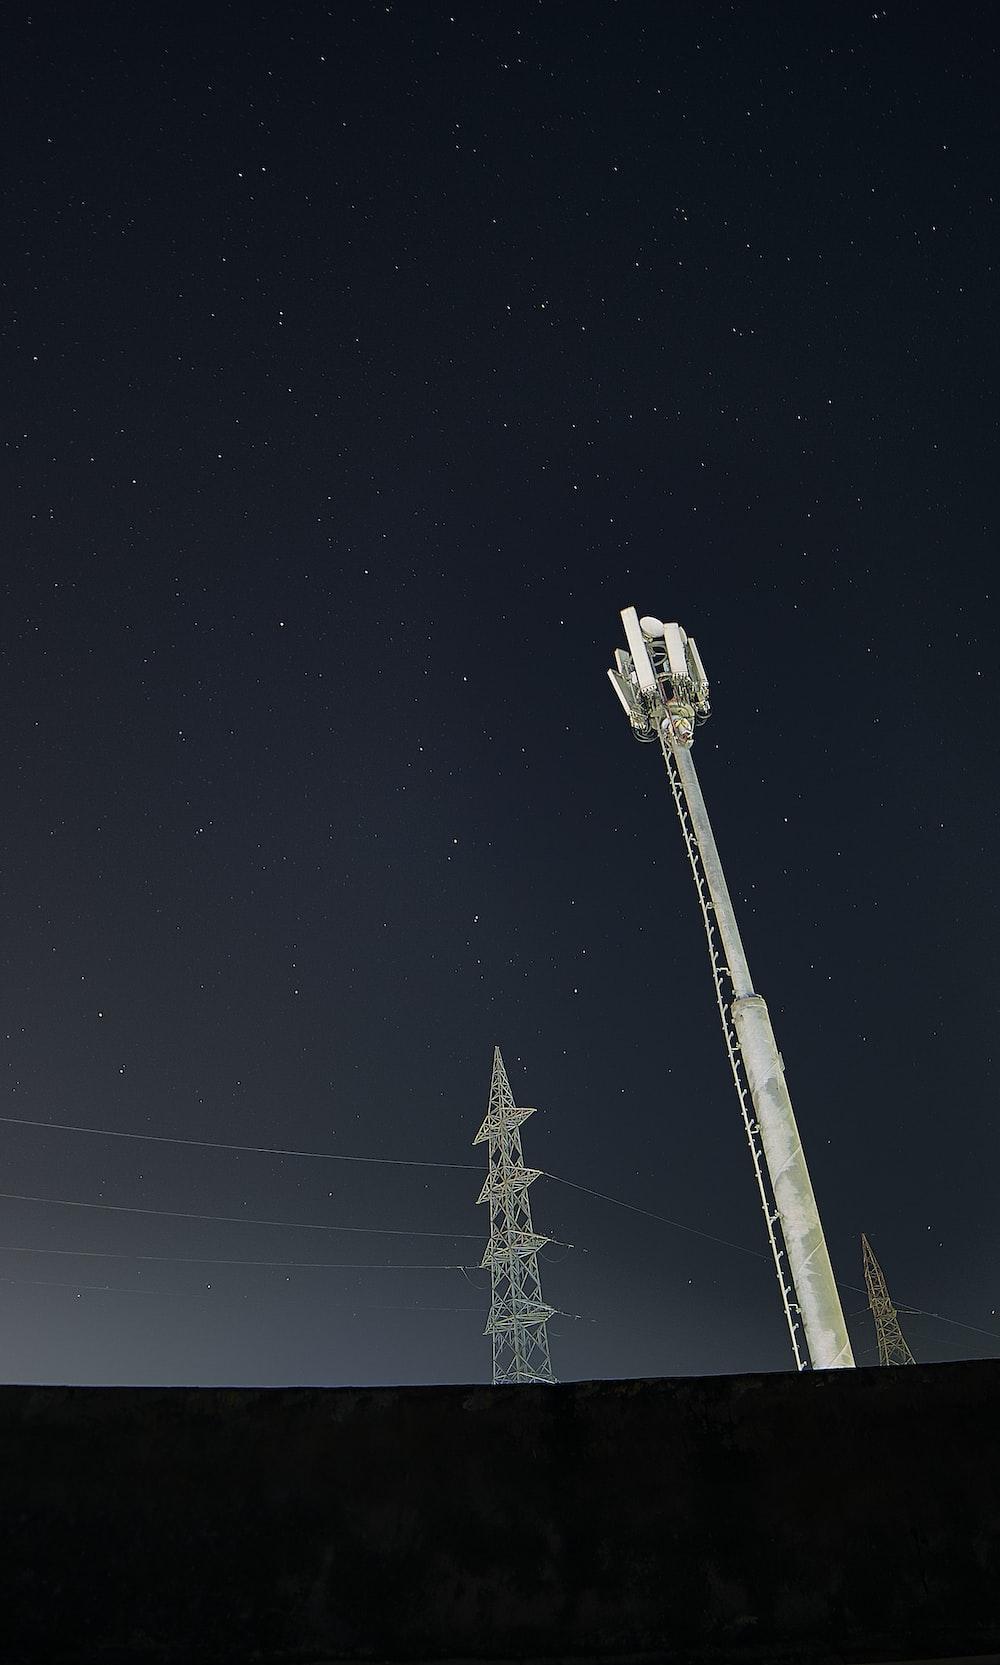 white and black satellite tower under black sky